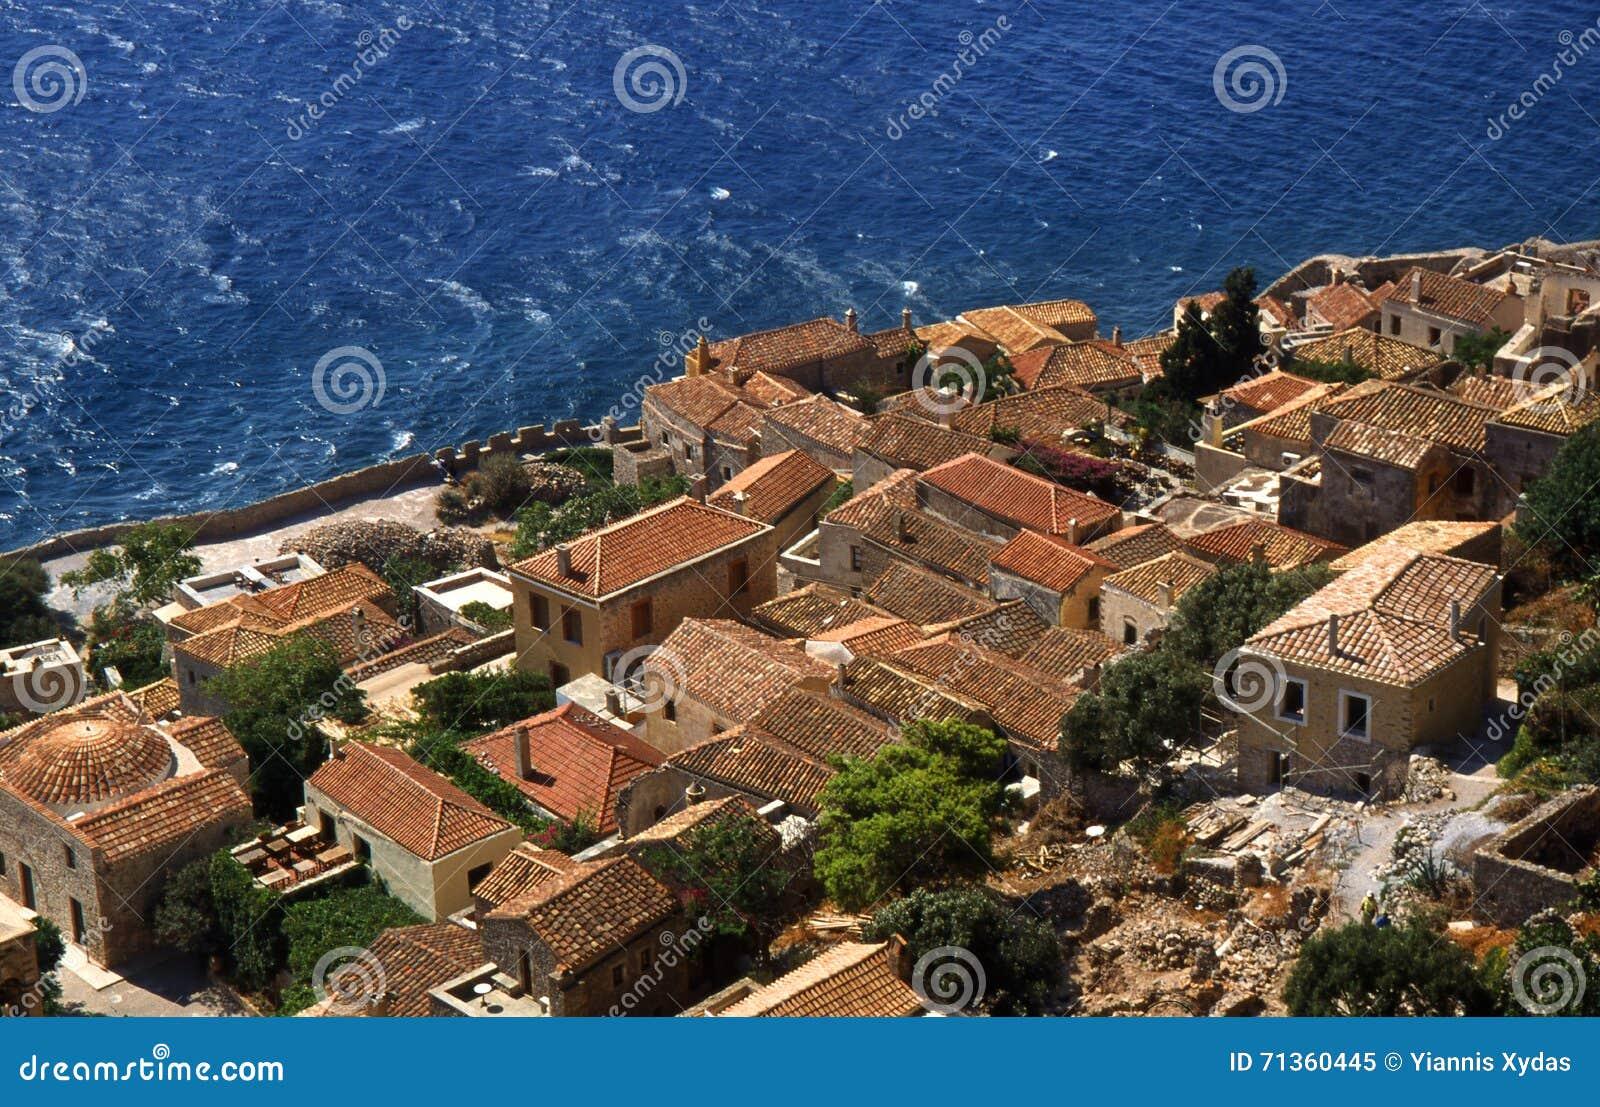 Monemvasia village in mountains on peninsula Monemvasia, Peloponnese, Greece/Beautiful ancient town Monem vasia, Greece